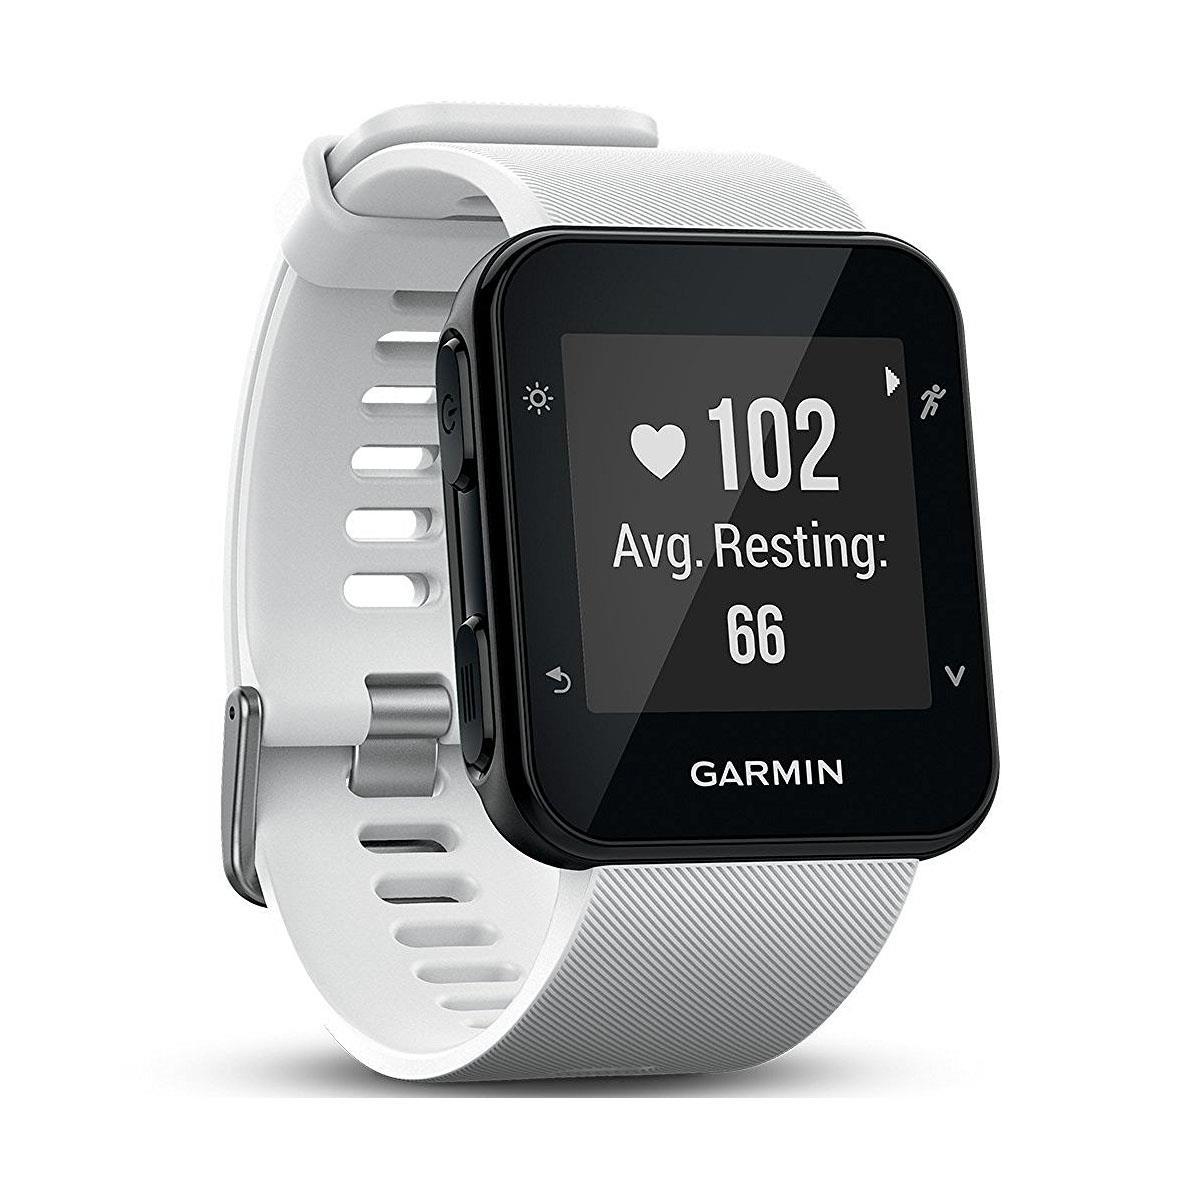 8539 relogio-esportivo-garmin-forerunner-35-com-gps-monitor-de-frequencia-cardiaca-e-touchscreen-a-prova-d-agua z5 636240451130826000.jpg 44ab80b326